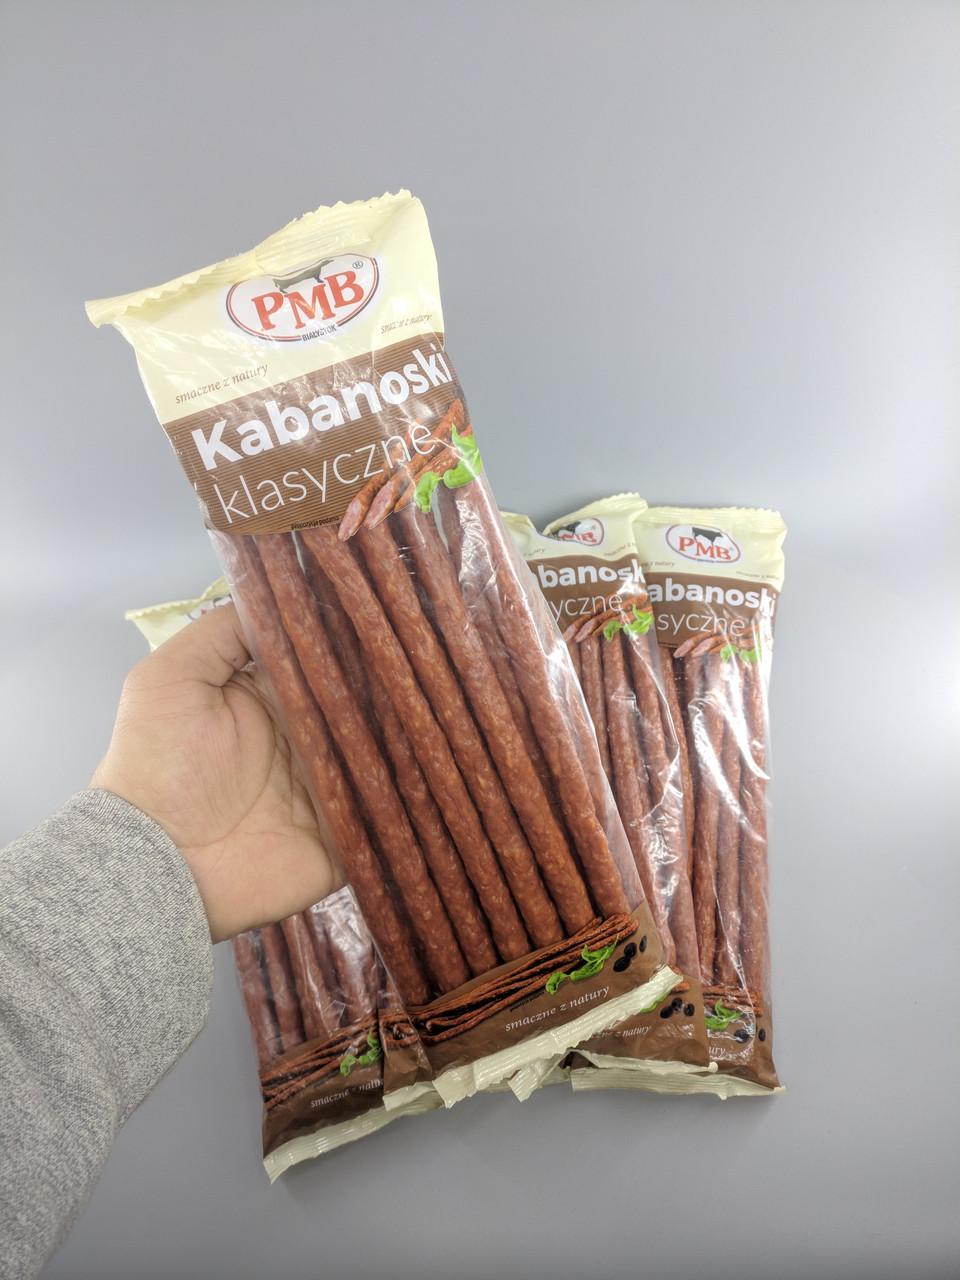 Кабаноси PMB Kabanoski (0,5кг)